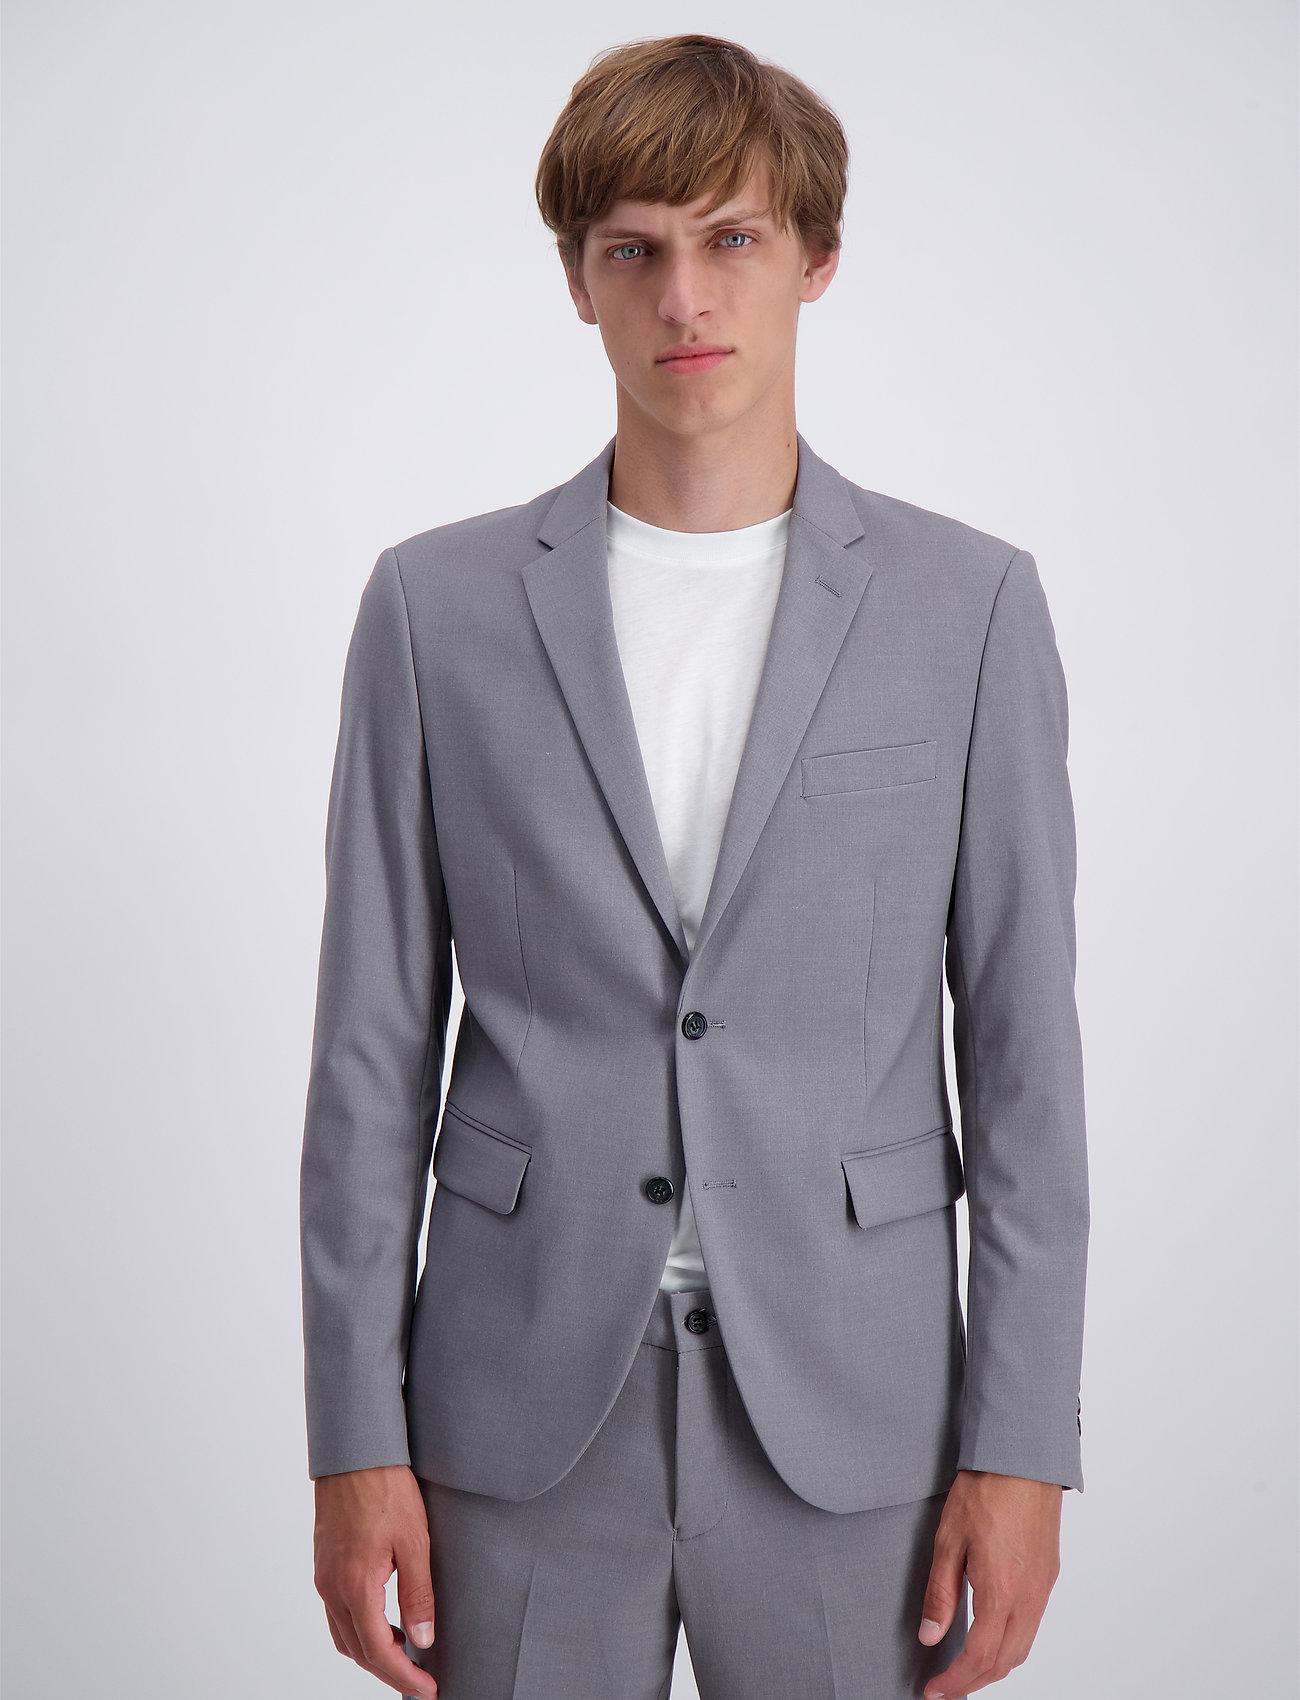 Lindbergh - Plain mens suit - yksiriviset puvut - lt grey mel - 0